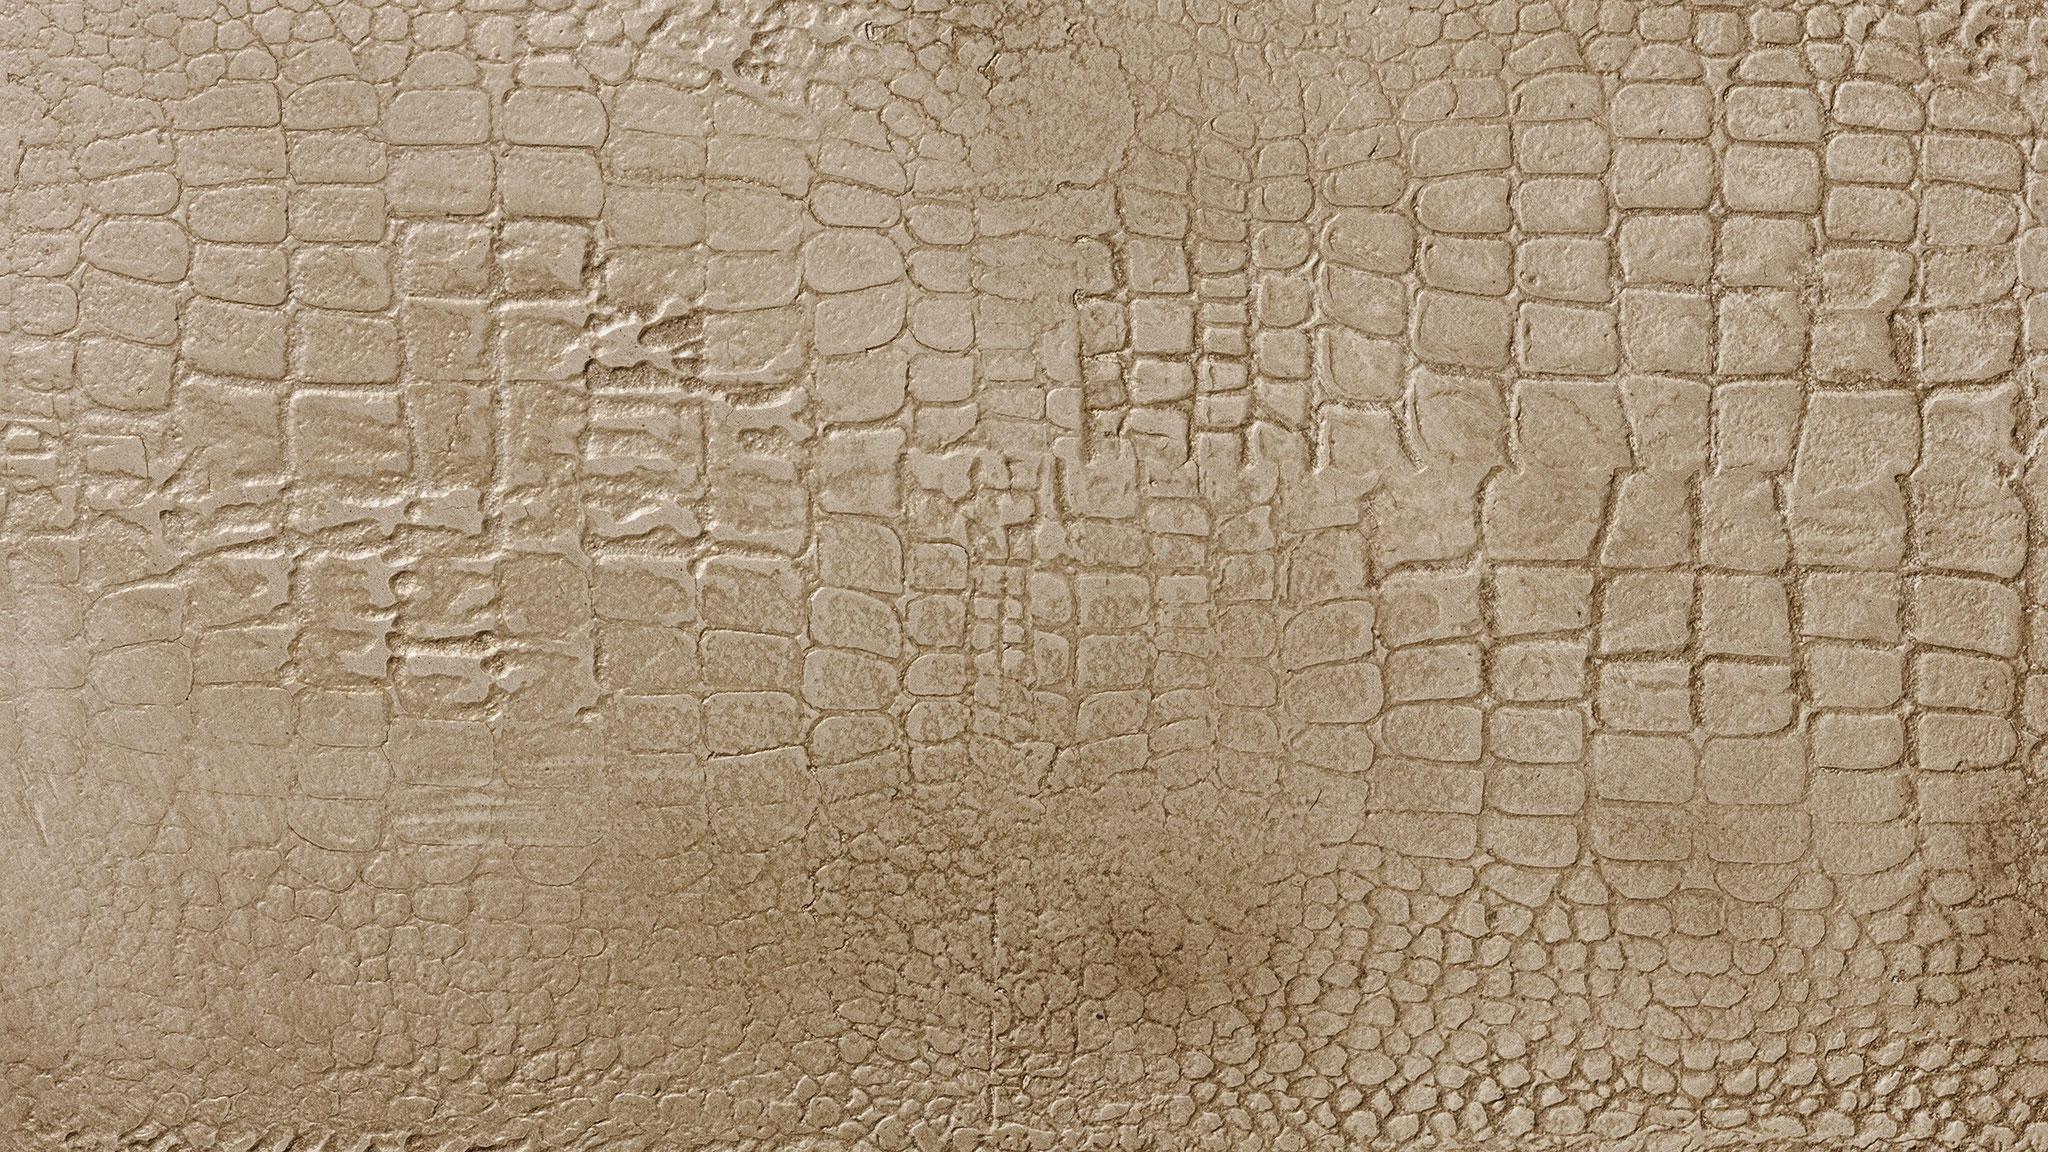 Caiman - Goldene Effekte in der Stempeltechnik betonen diese reptilenhautartige Oberfläche. Farbtöne: ic132, StoLook Ort